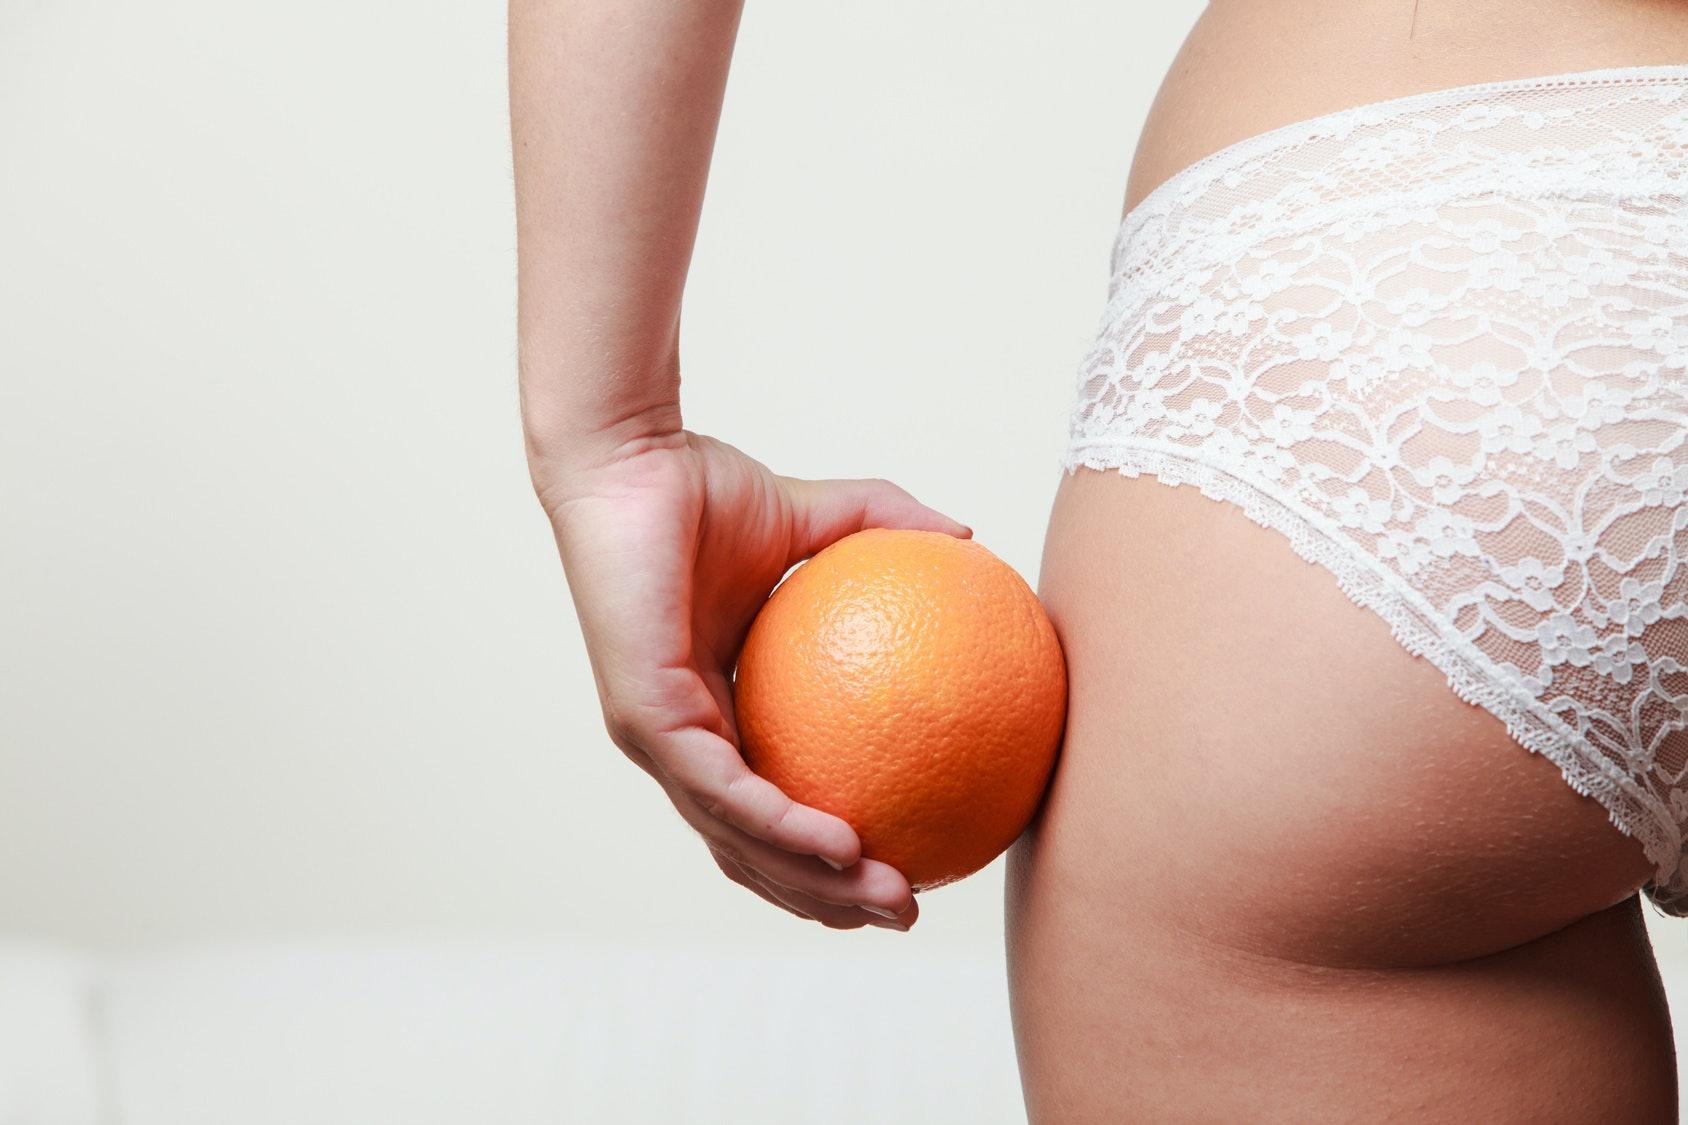 hottest milf porn ever